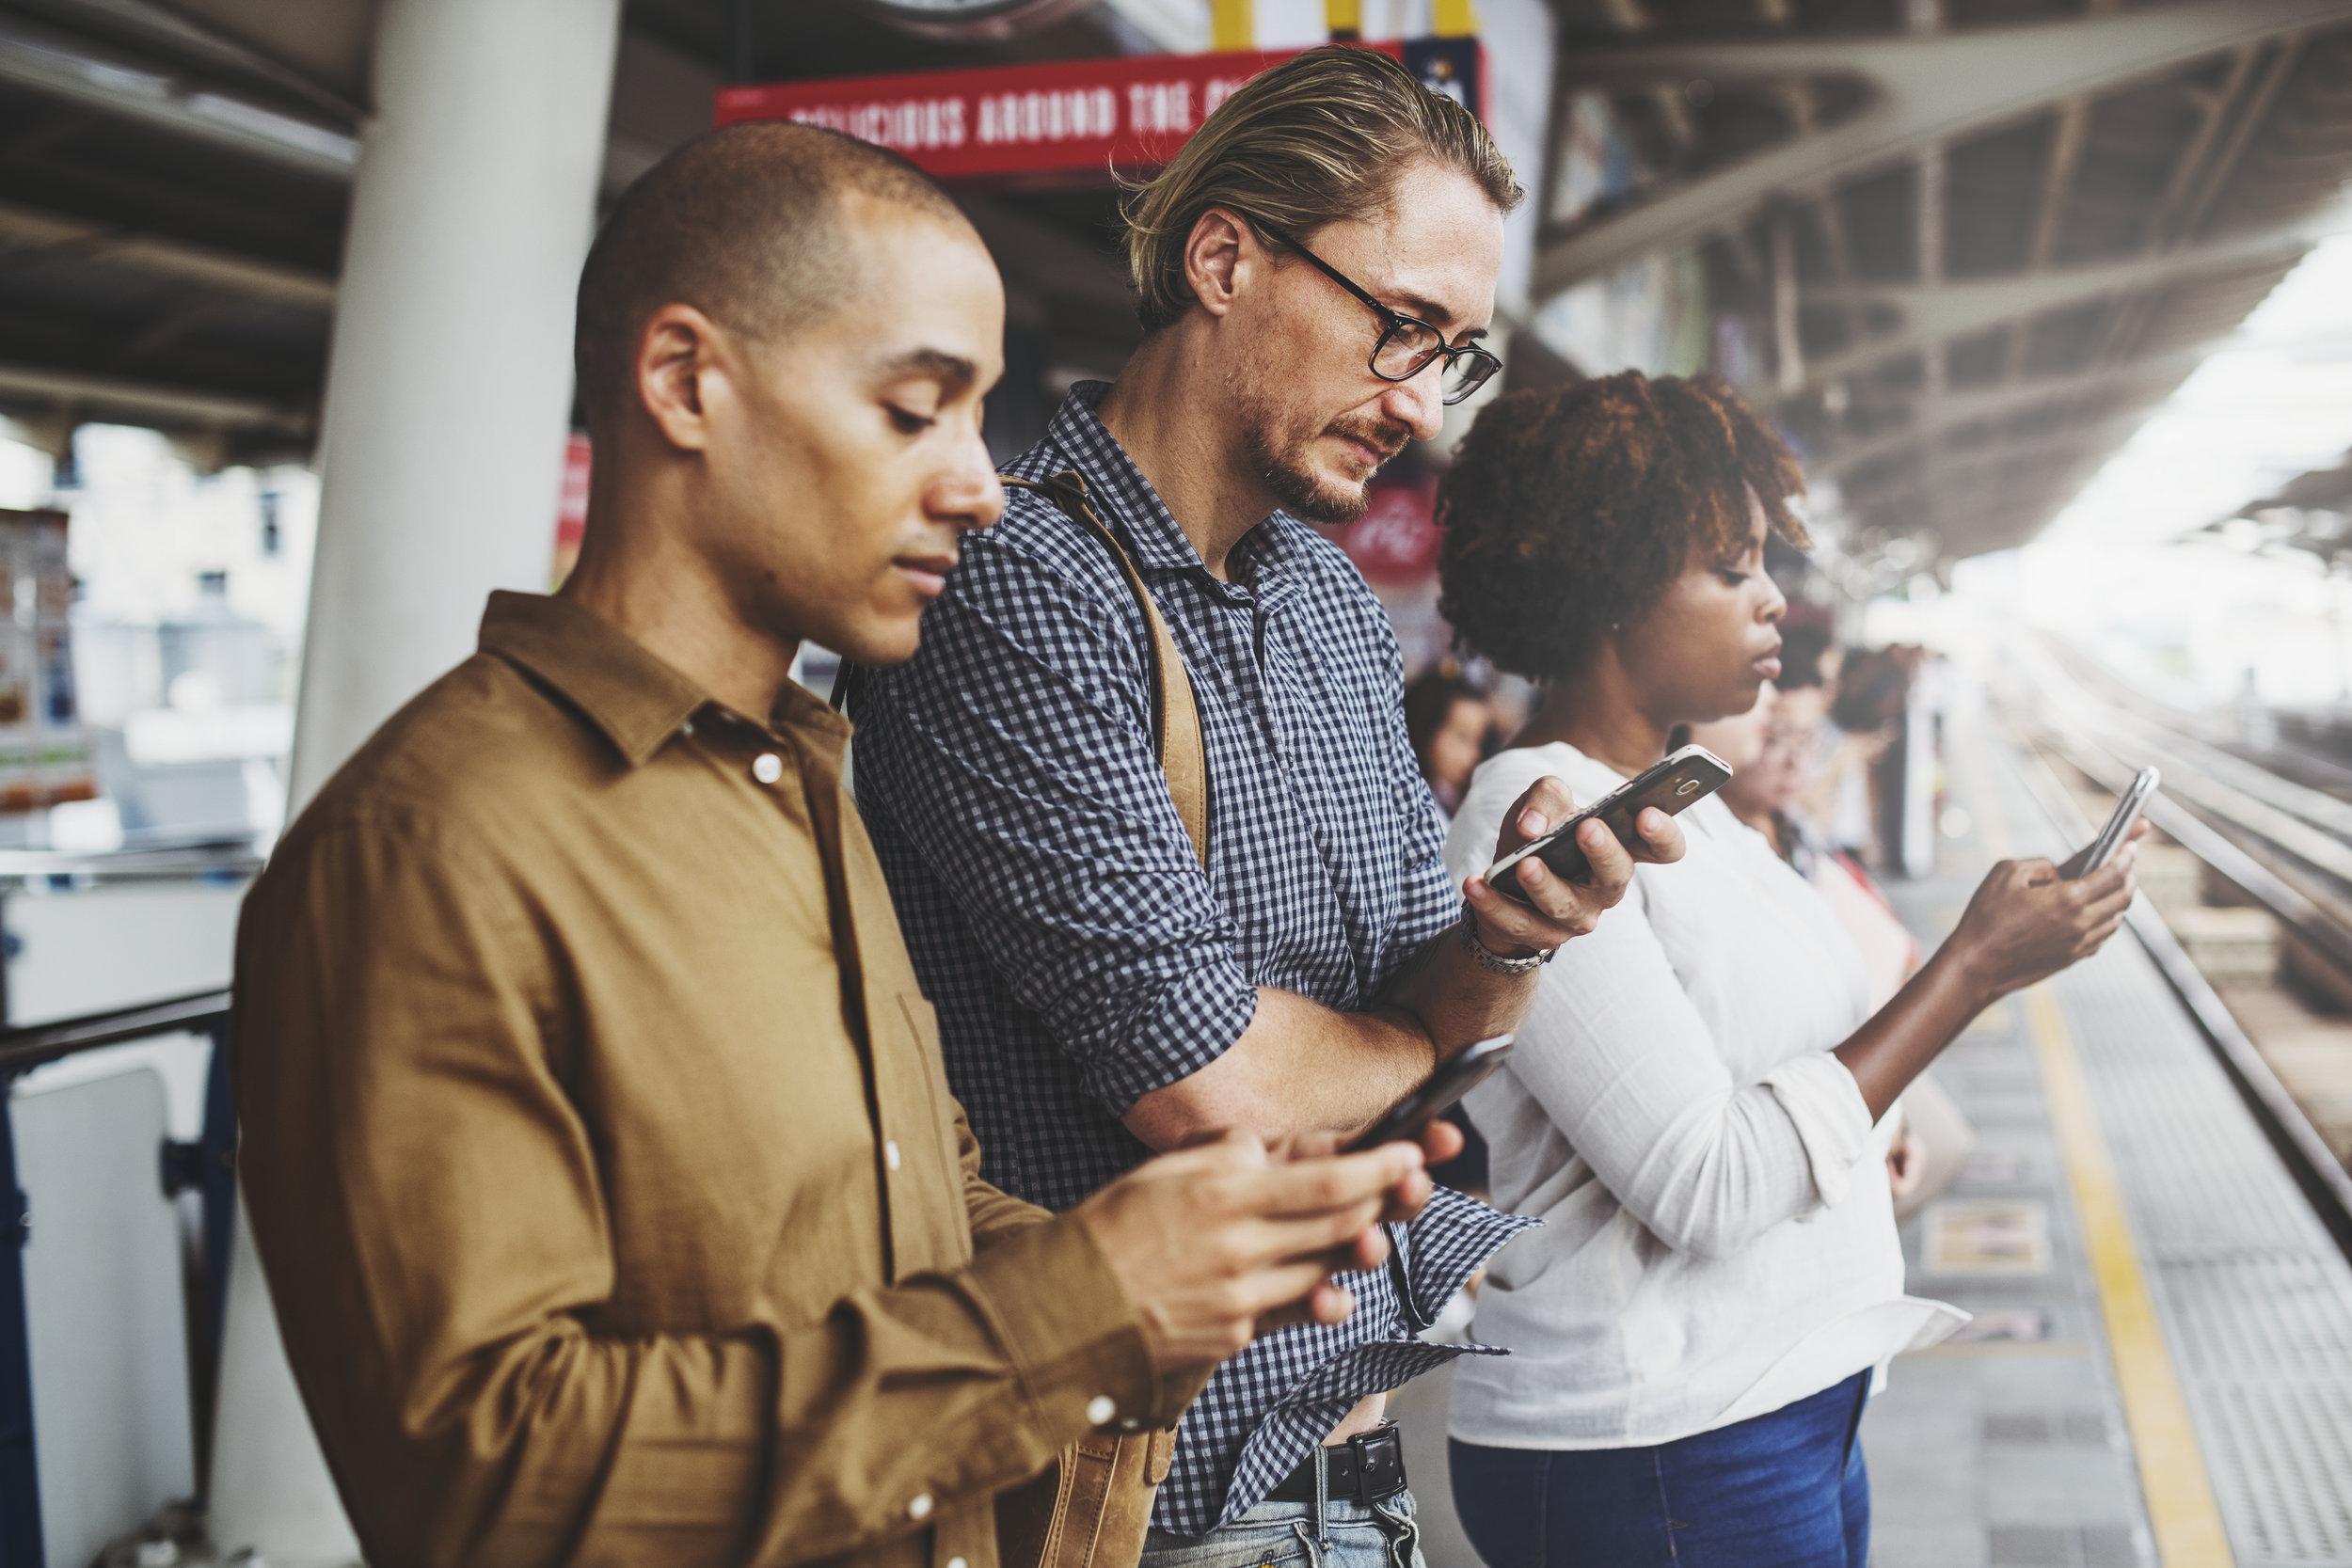 People using smartphones on the train platform